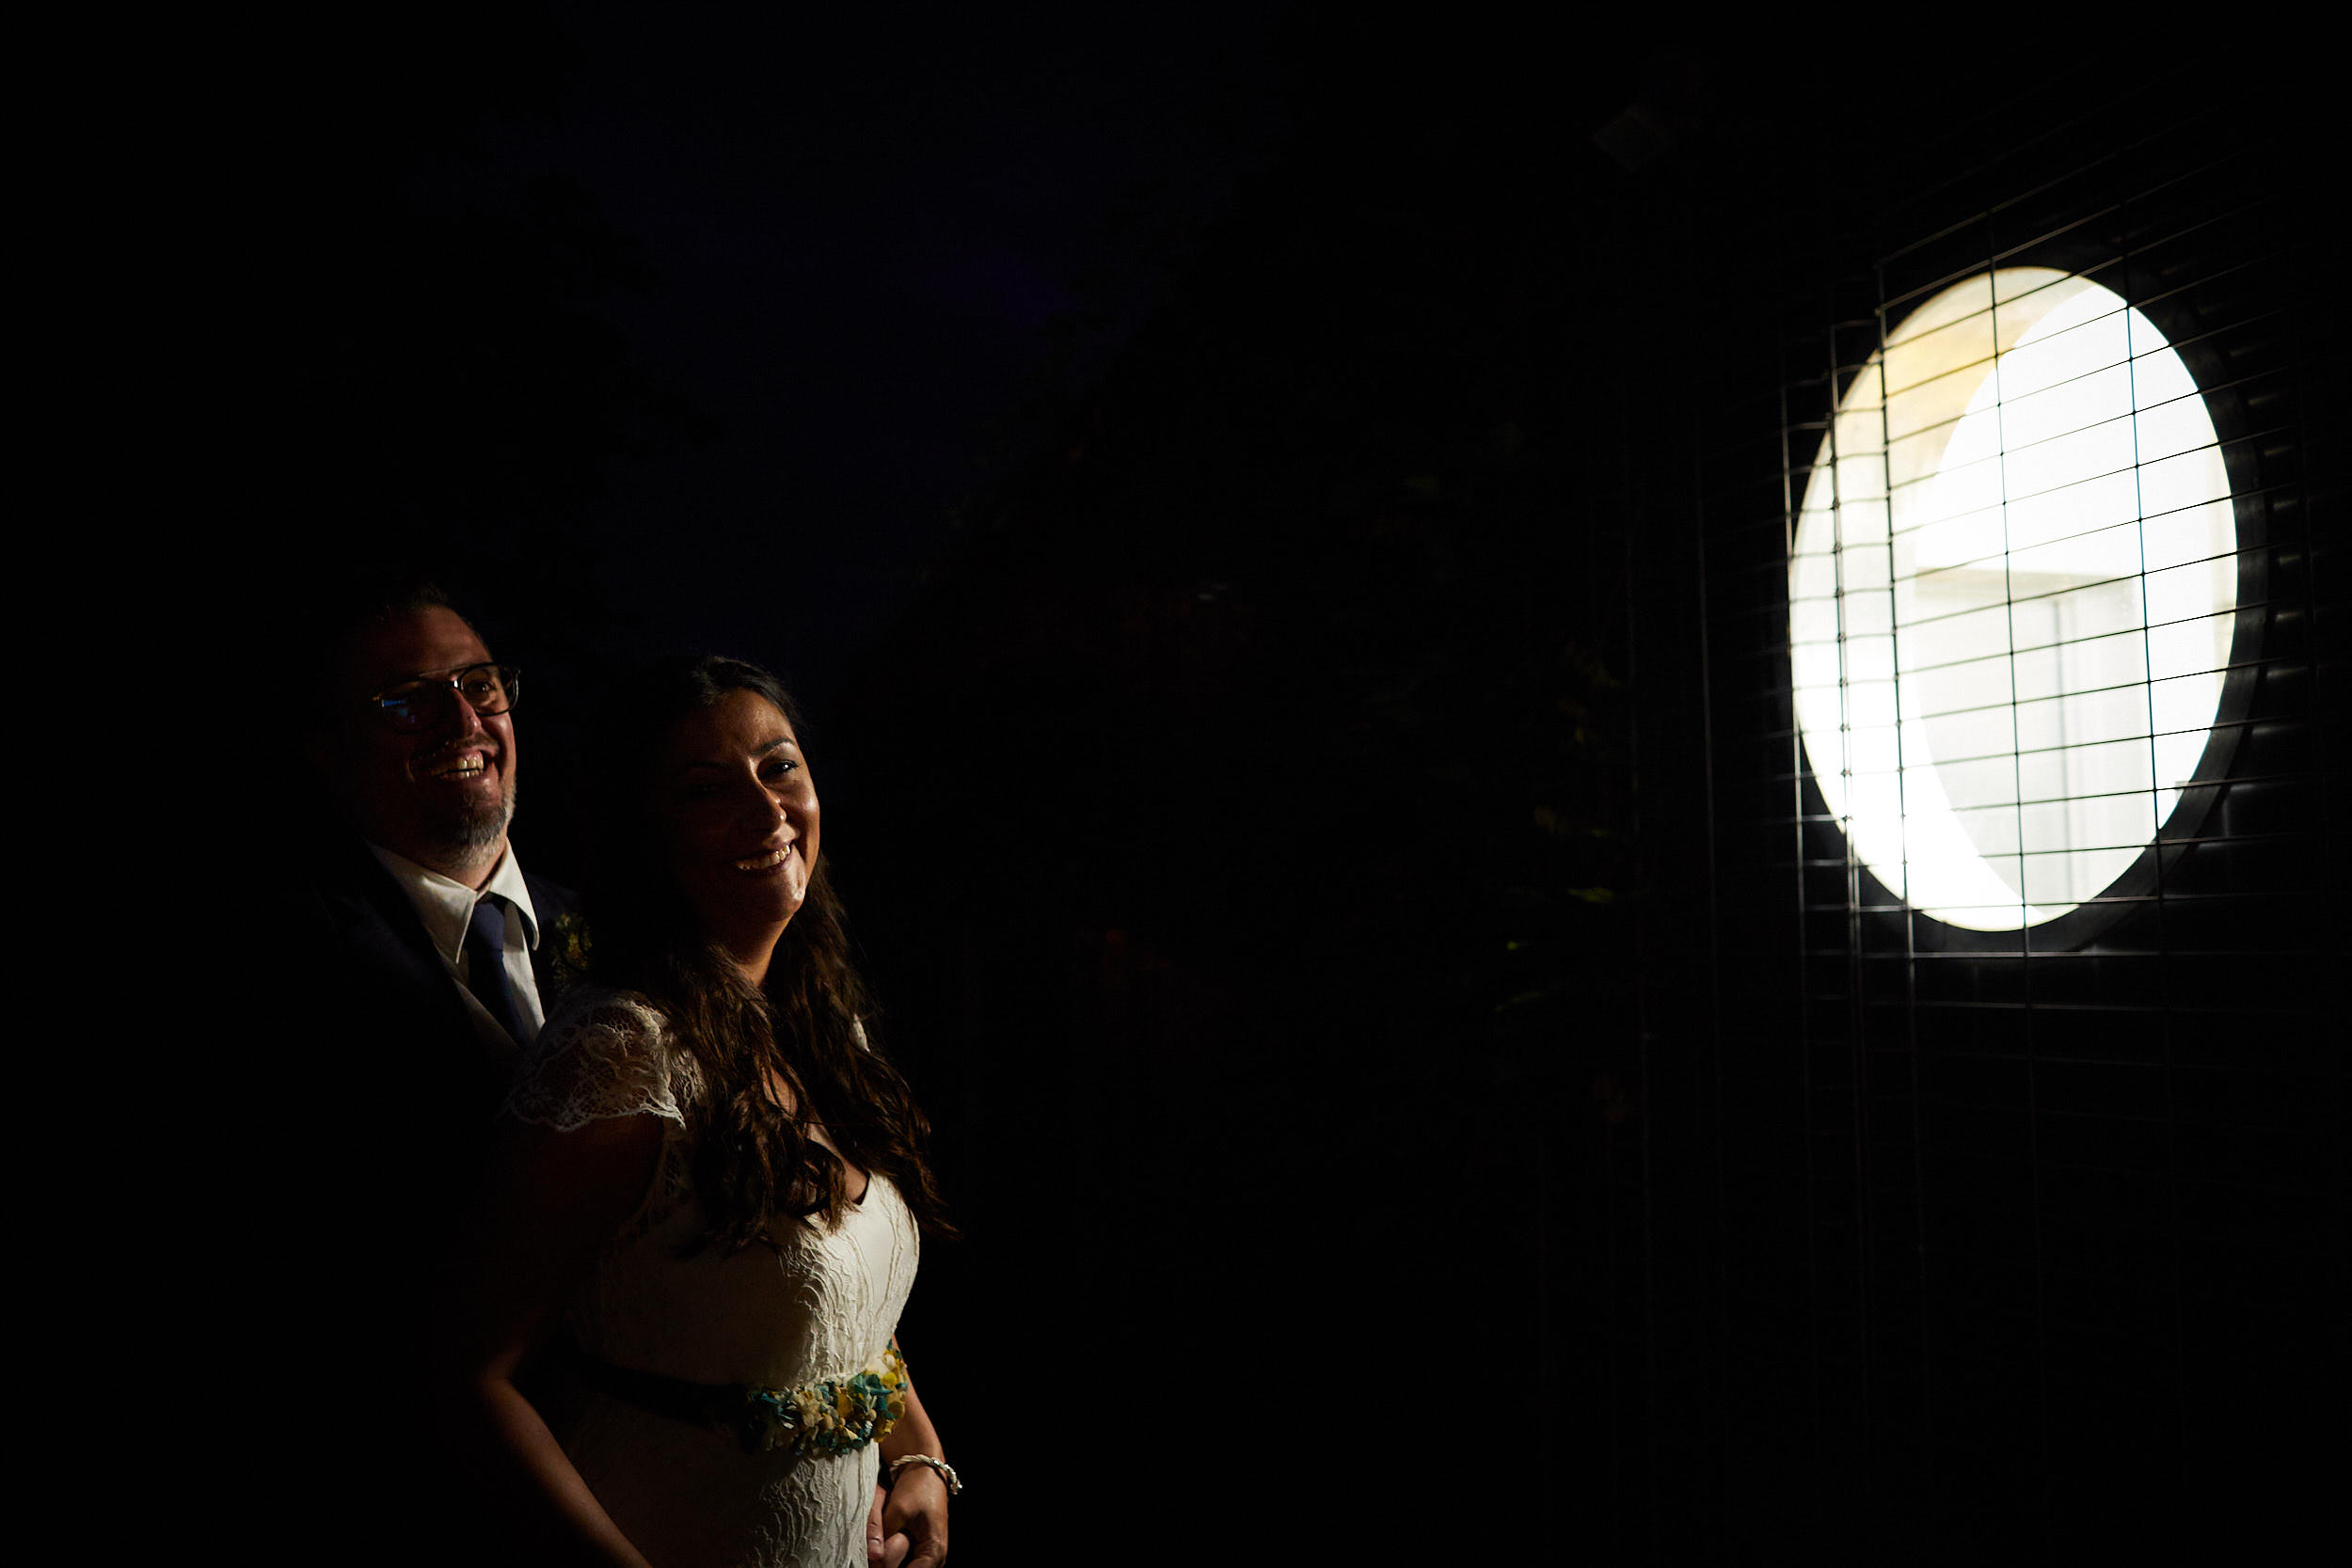 1809Basque_Country_Rioja_Wedding_Photographer_James_Sturcke_0031.jpg